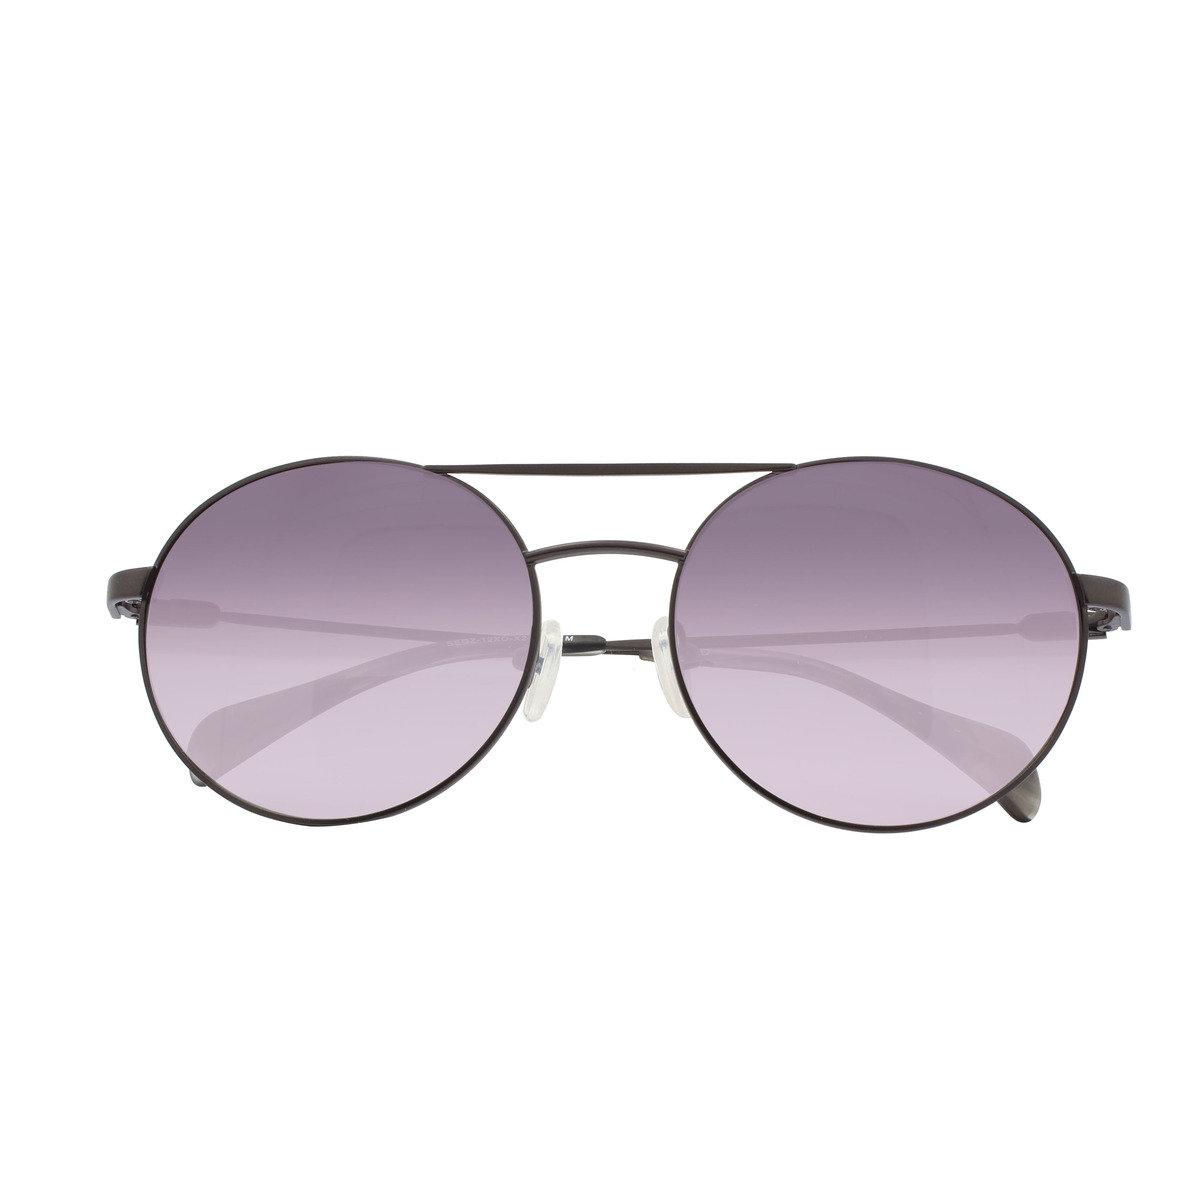 eGG 圓框金屬防UV深灰太陽眼鏡